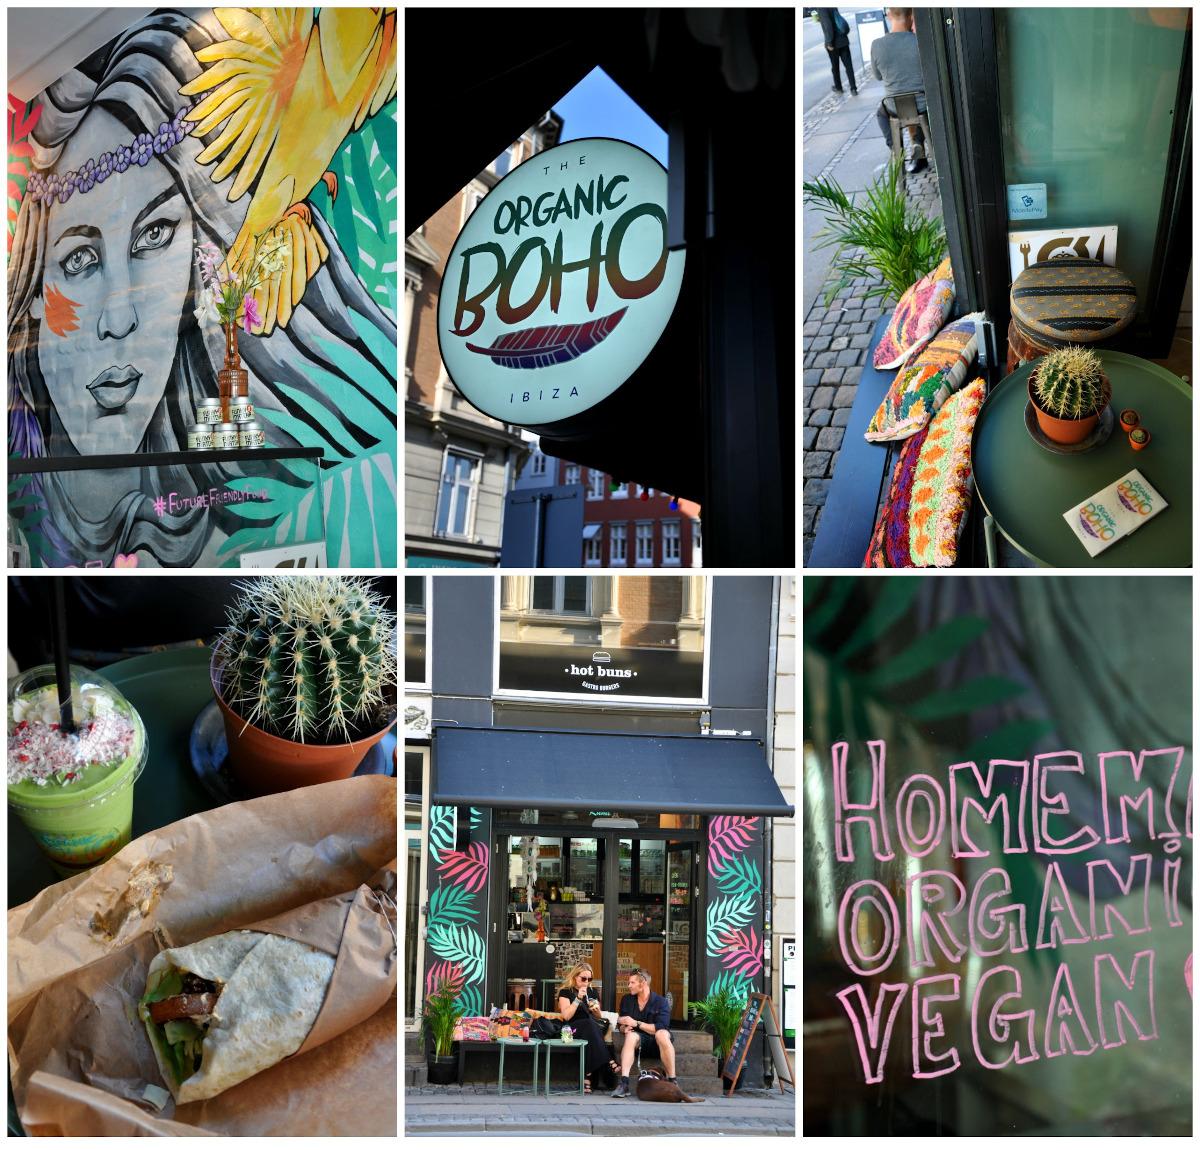 Copenhagen The Organic Hobo